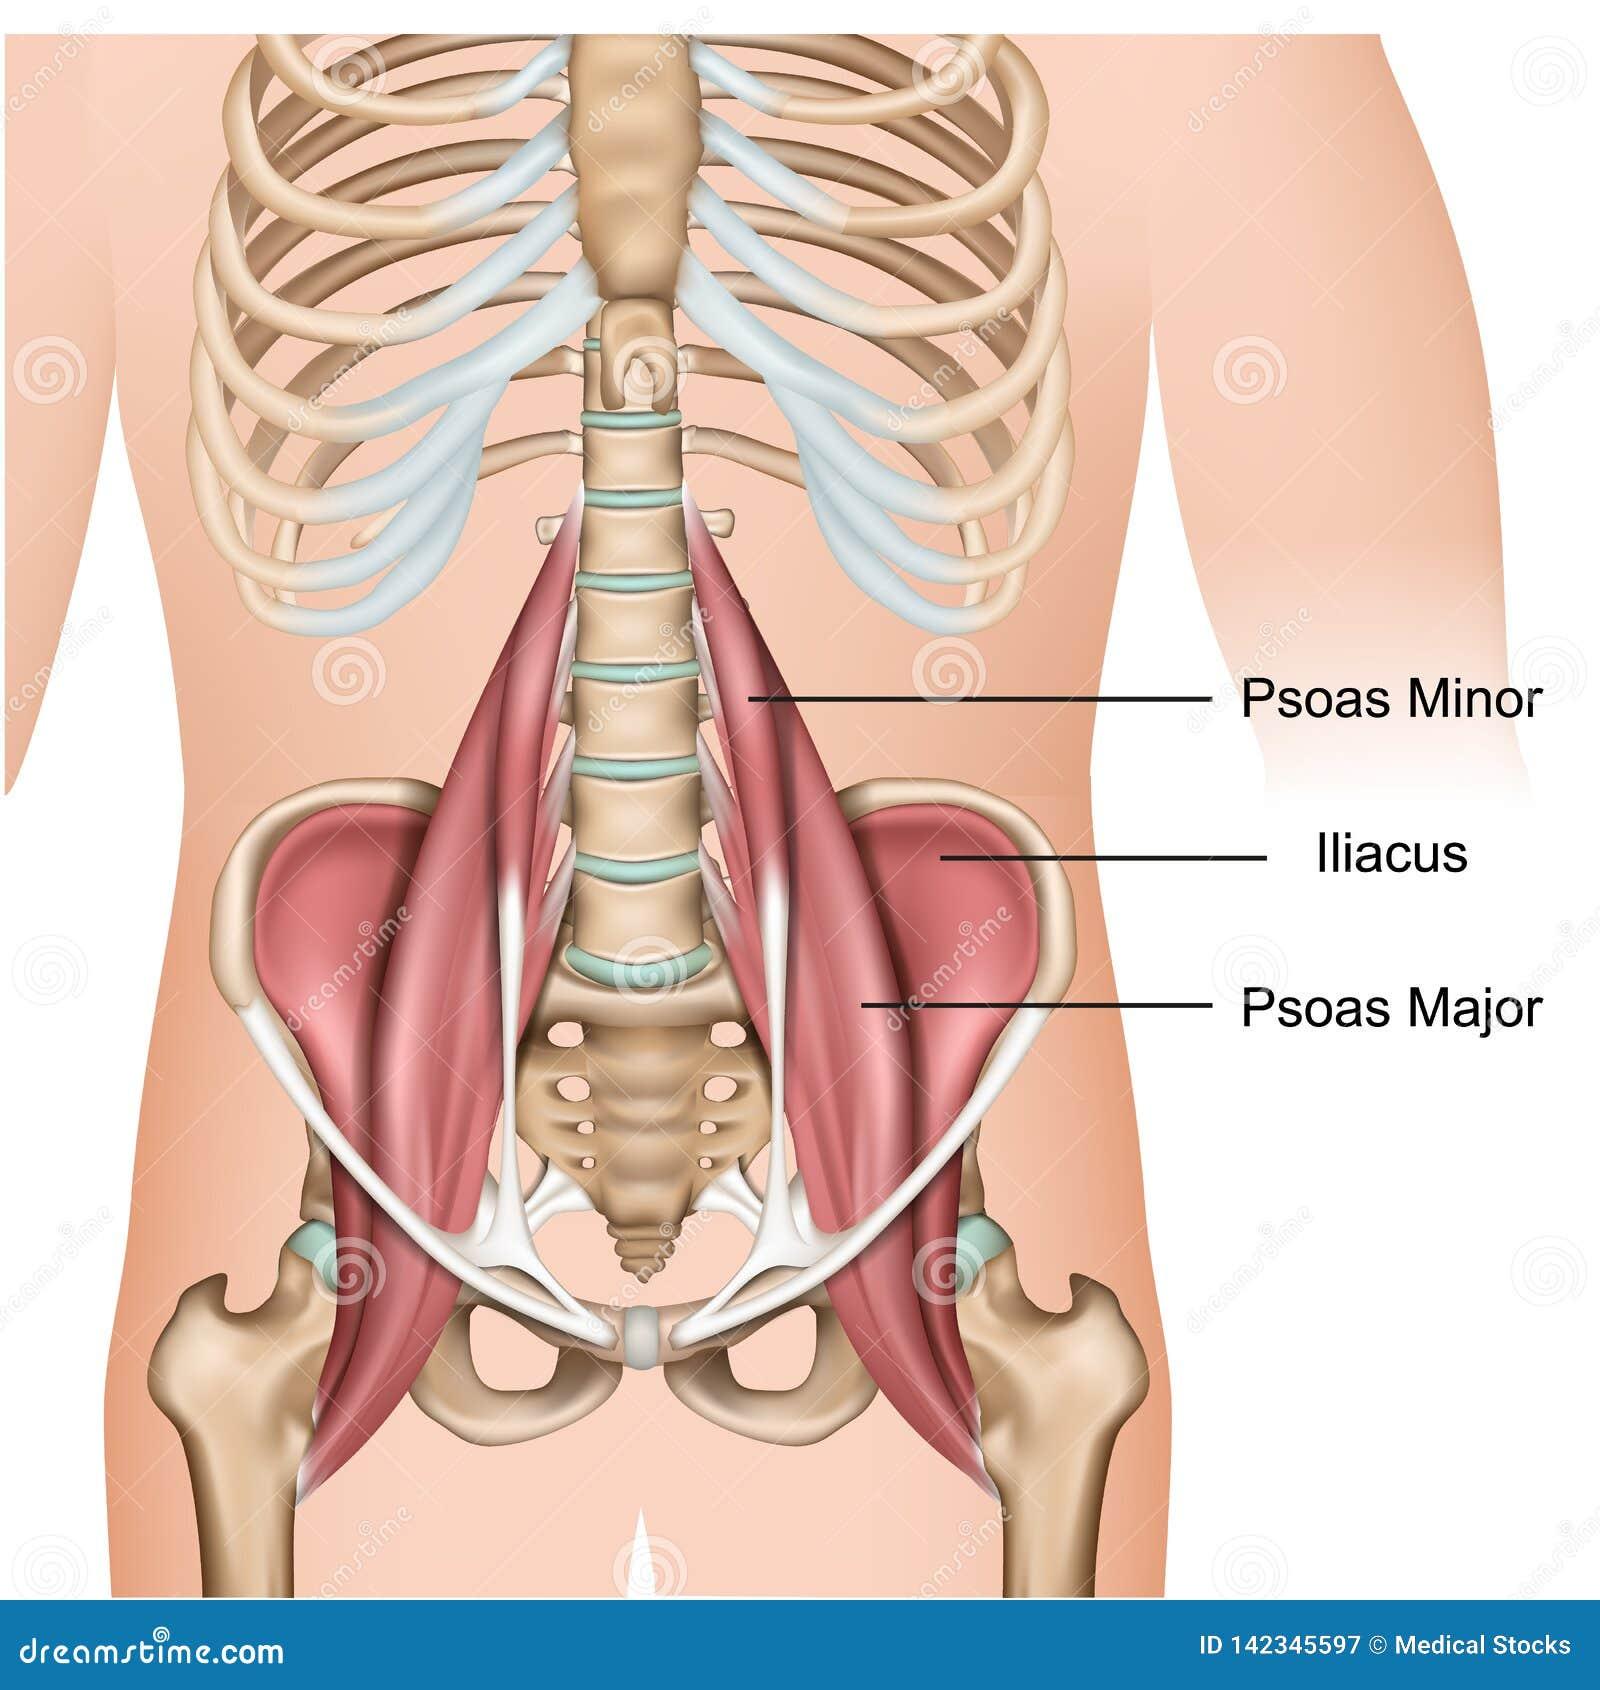 Psoas - σημαντική τρισδιάστατη ιατρική διανυσματική απεικόνιση ανατομίας μυών στο άσπρο υπόβαθρο